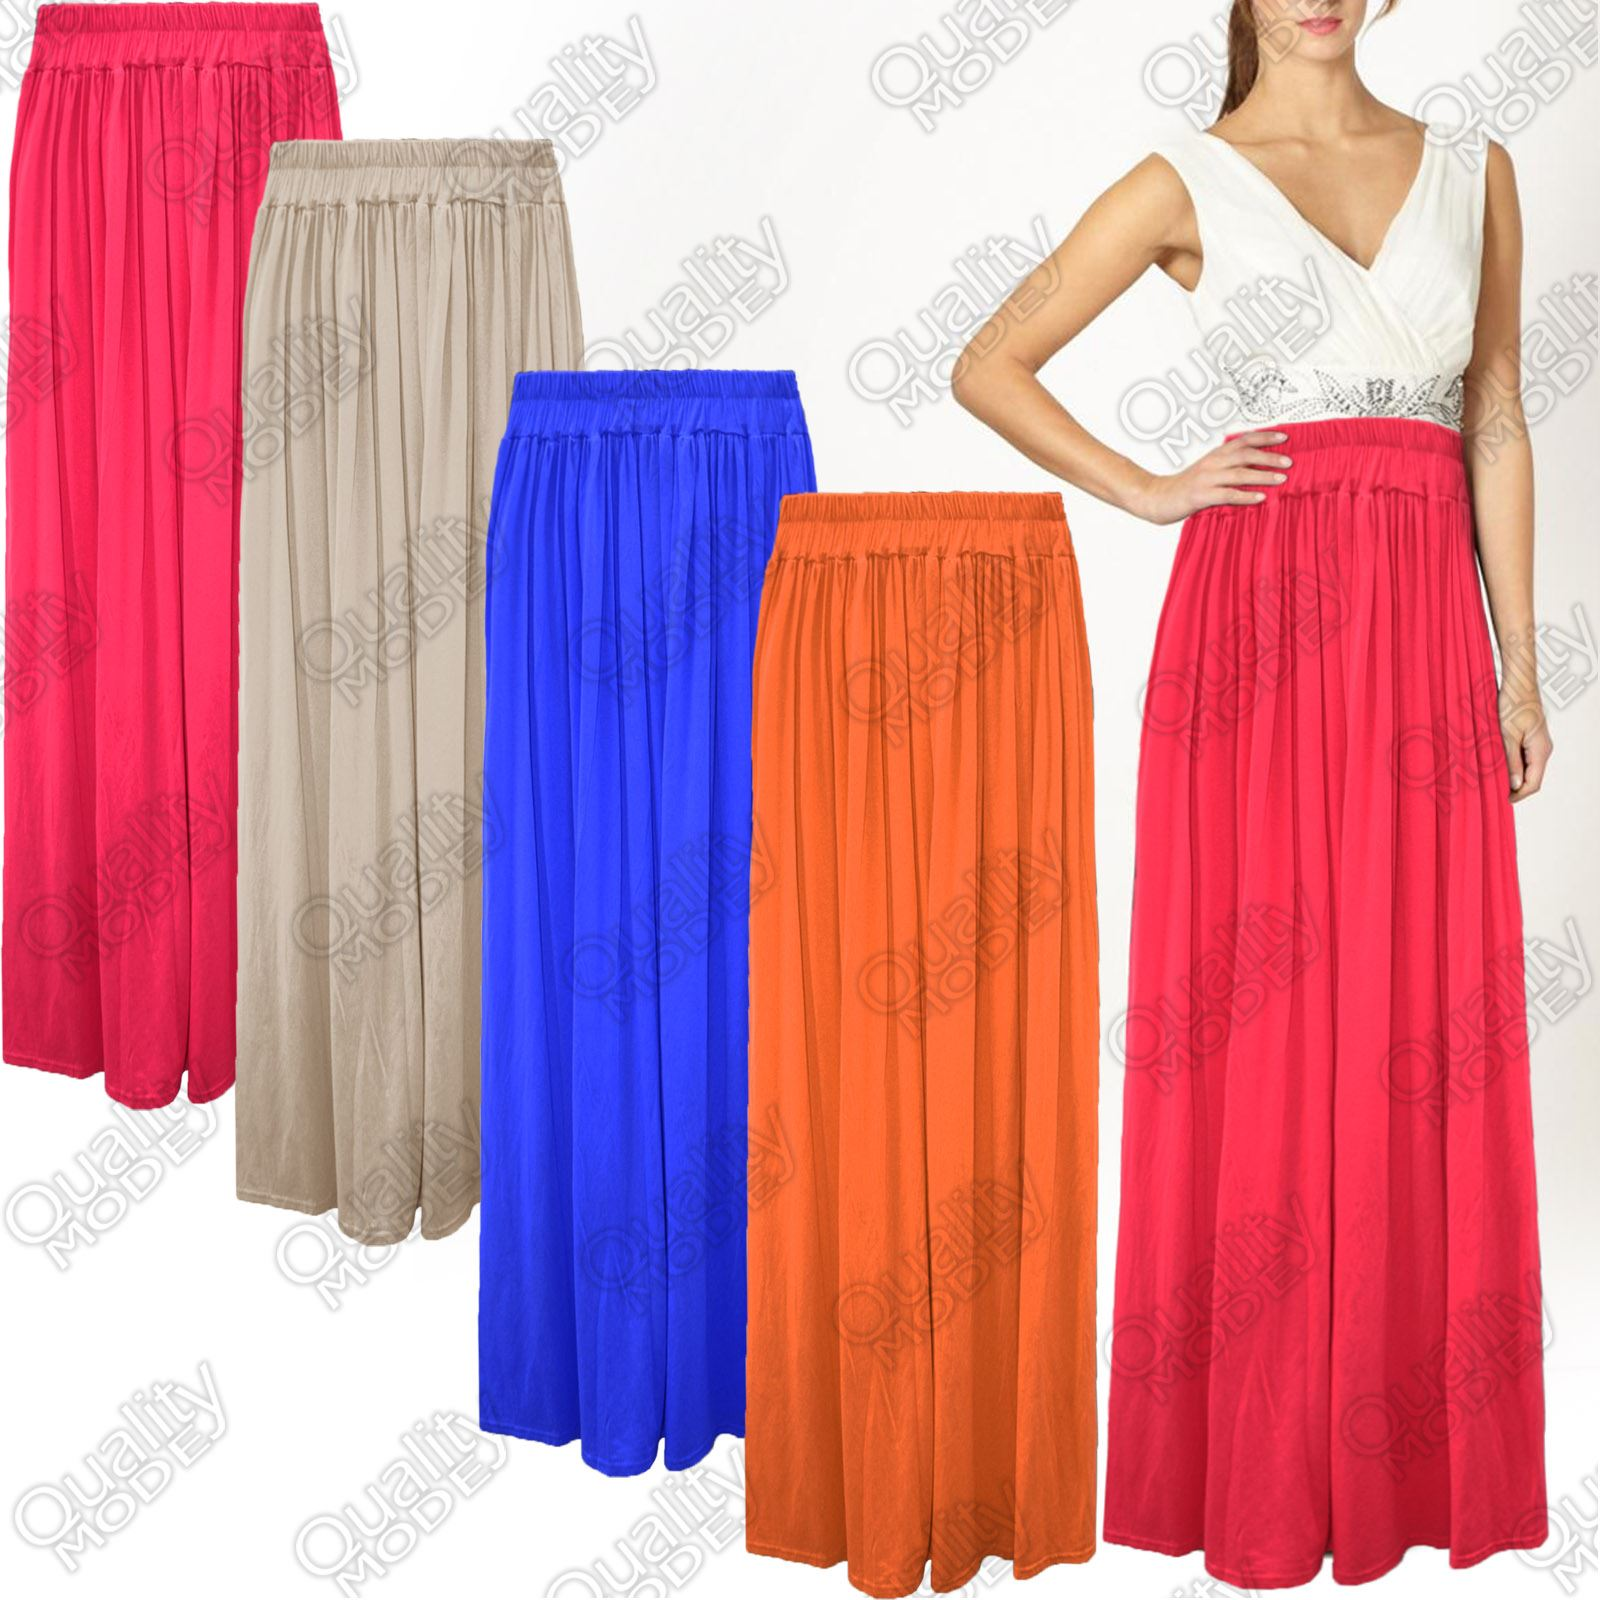 womens pleated jersey skirt length